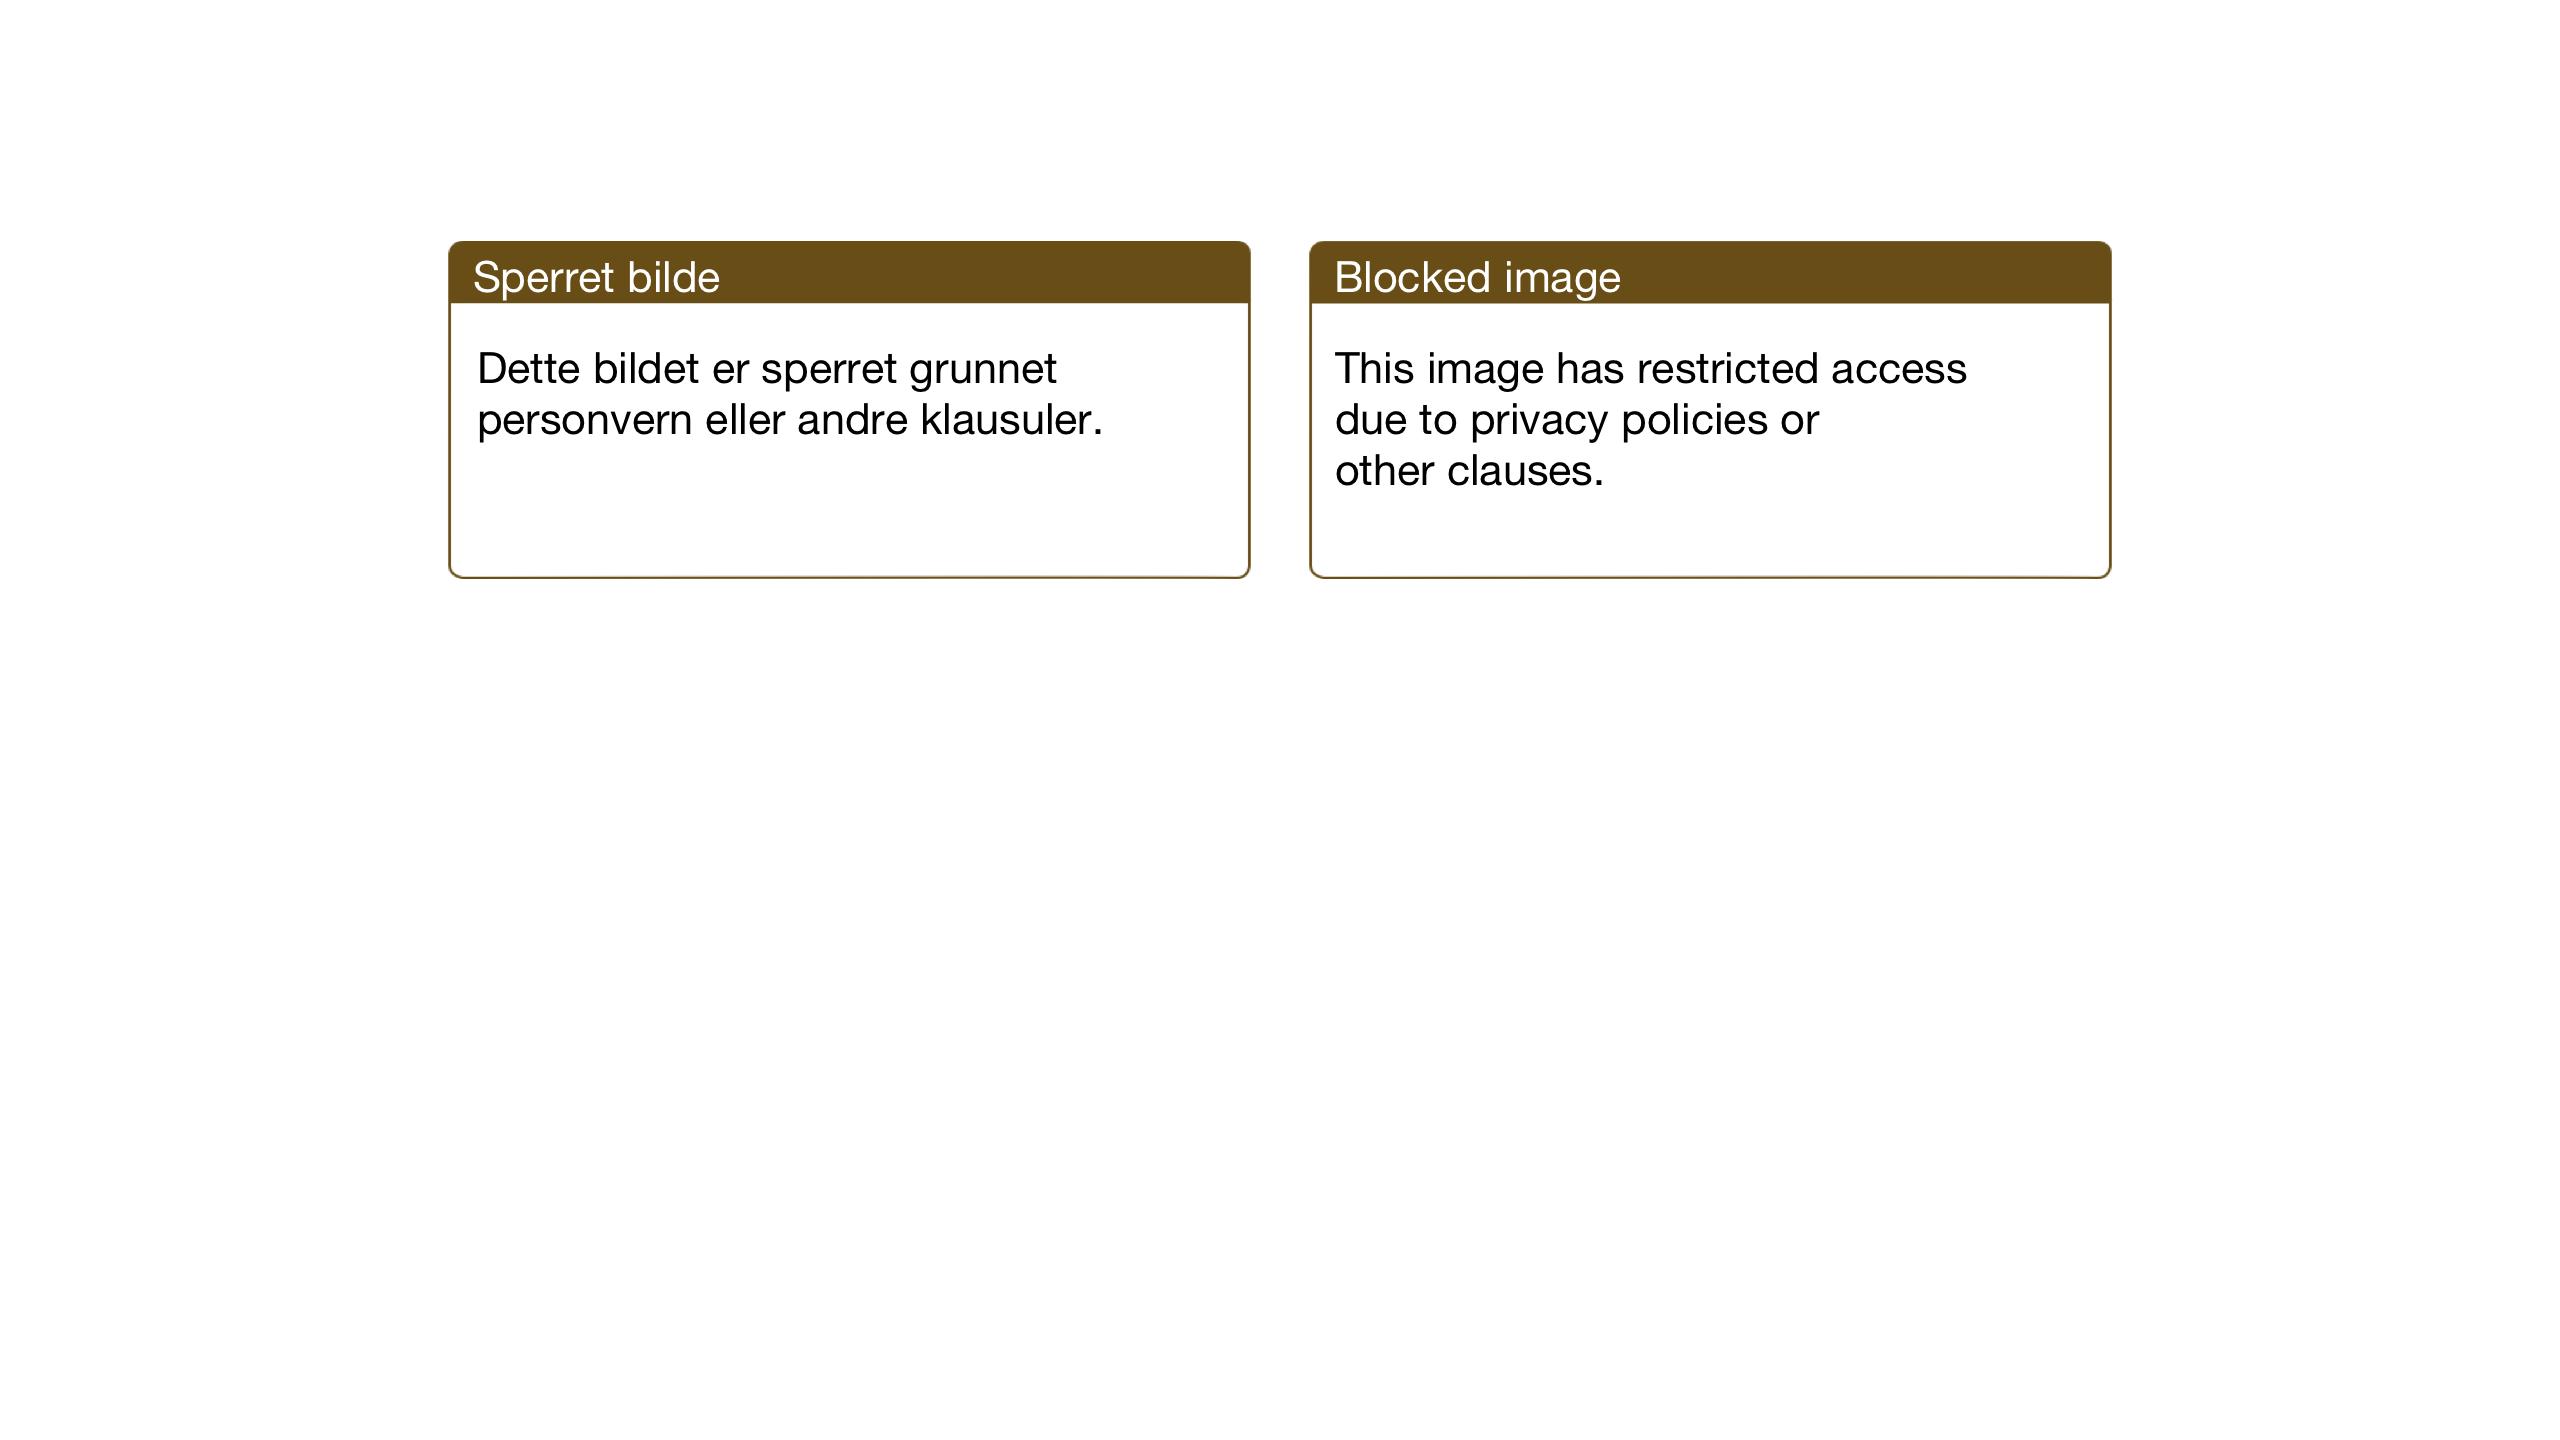 SAT, Ministerialprotokoller, klokkerbøker og fødselsregistre - Nordland, 847/L0680: Klokkerbok nr. 847C08, 1930-1947, s. 301